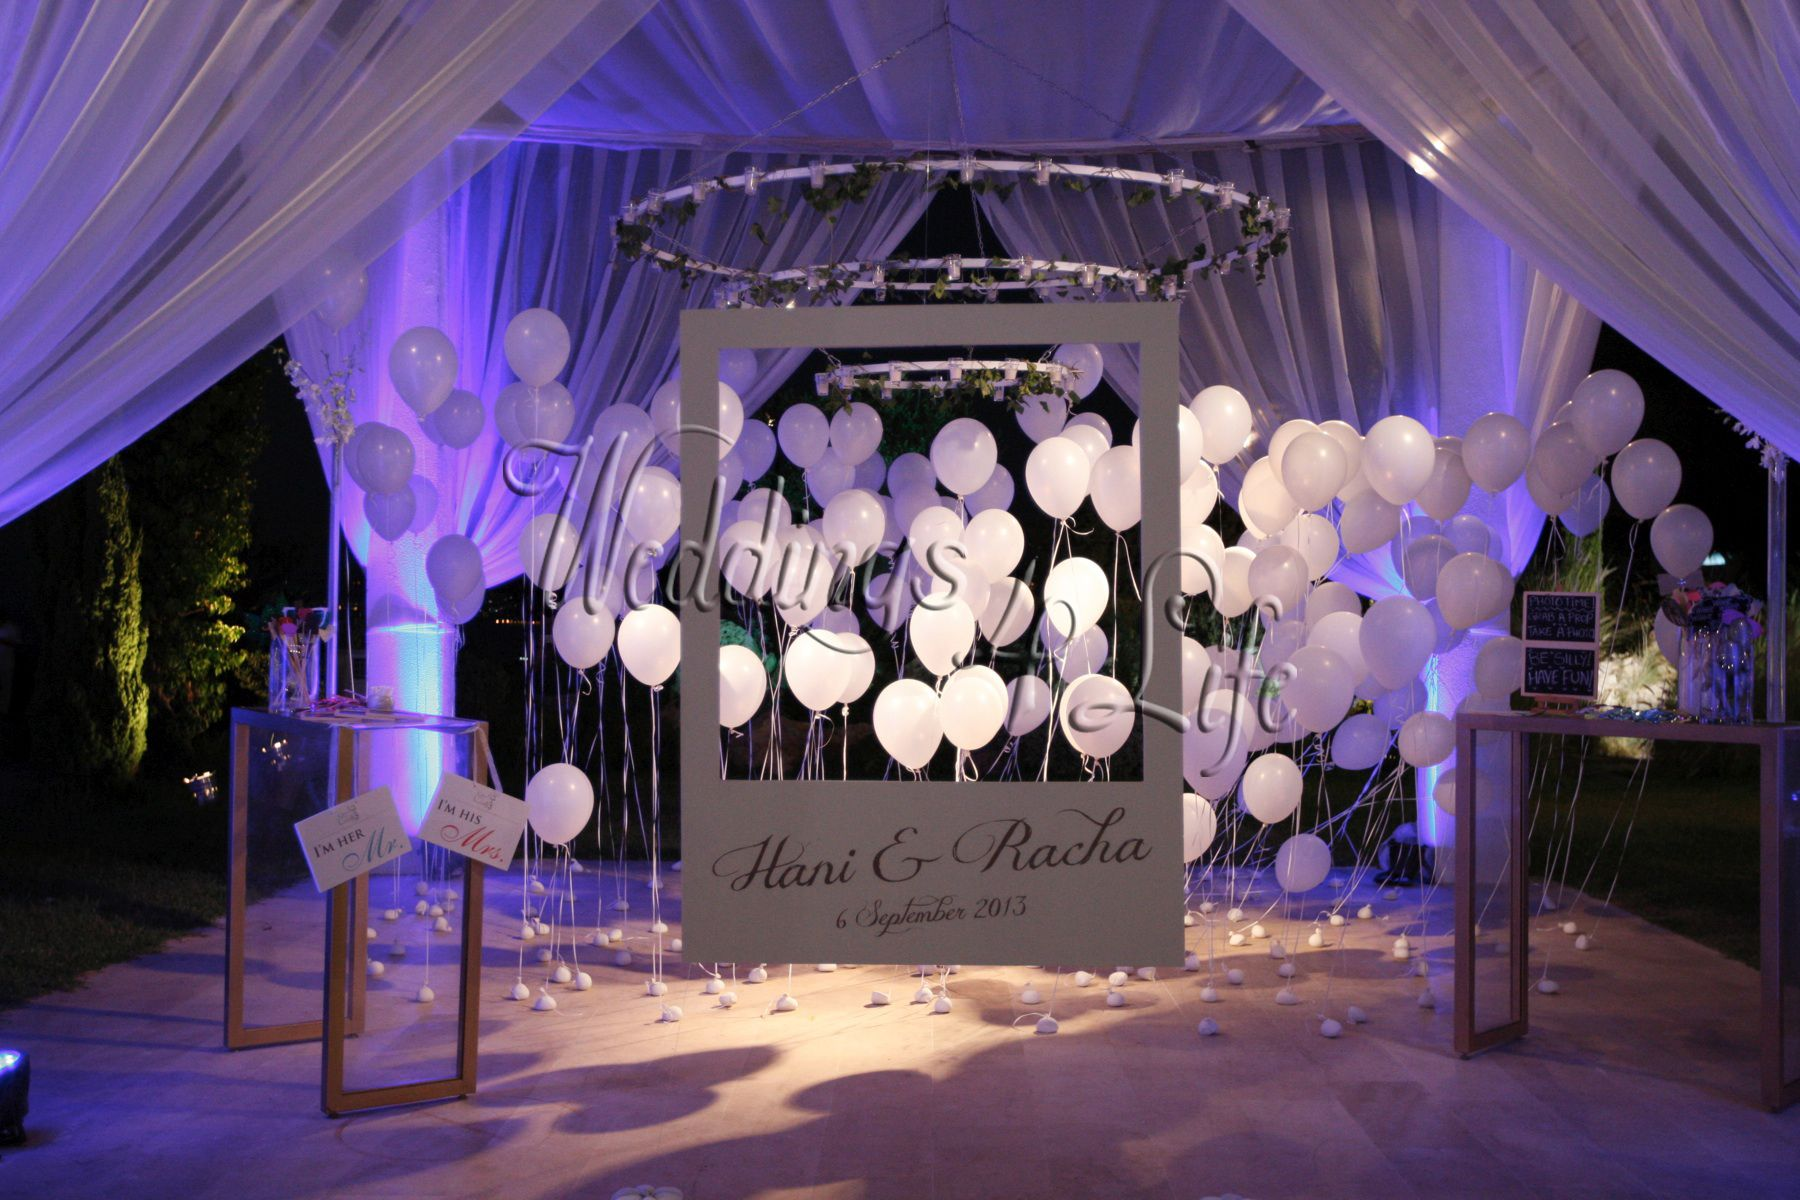 Wedding design ideas by weddings 4 life lebanon httpwww wedding design ideas by weddings 4 life lebanon httpmyfarah junglespirit Gallery